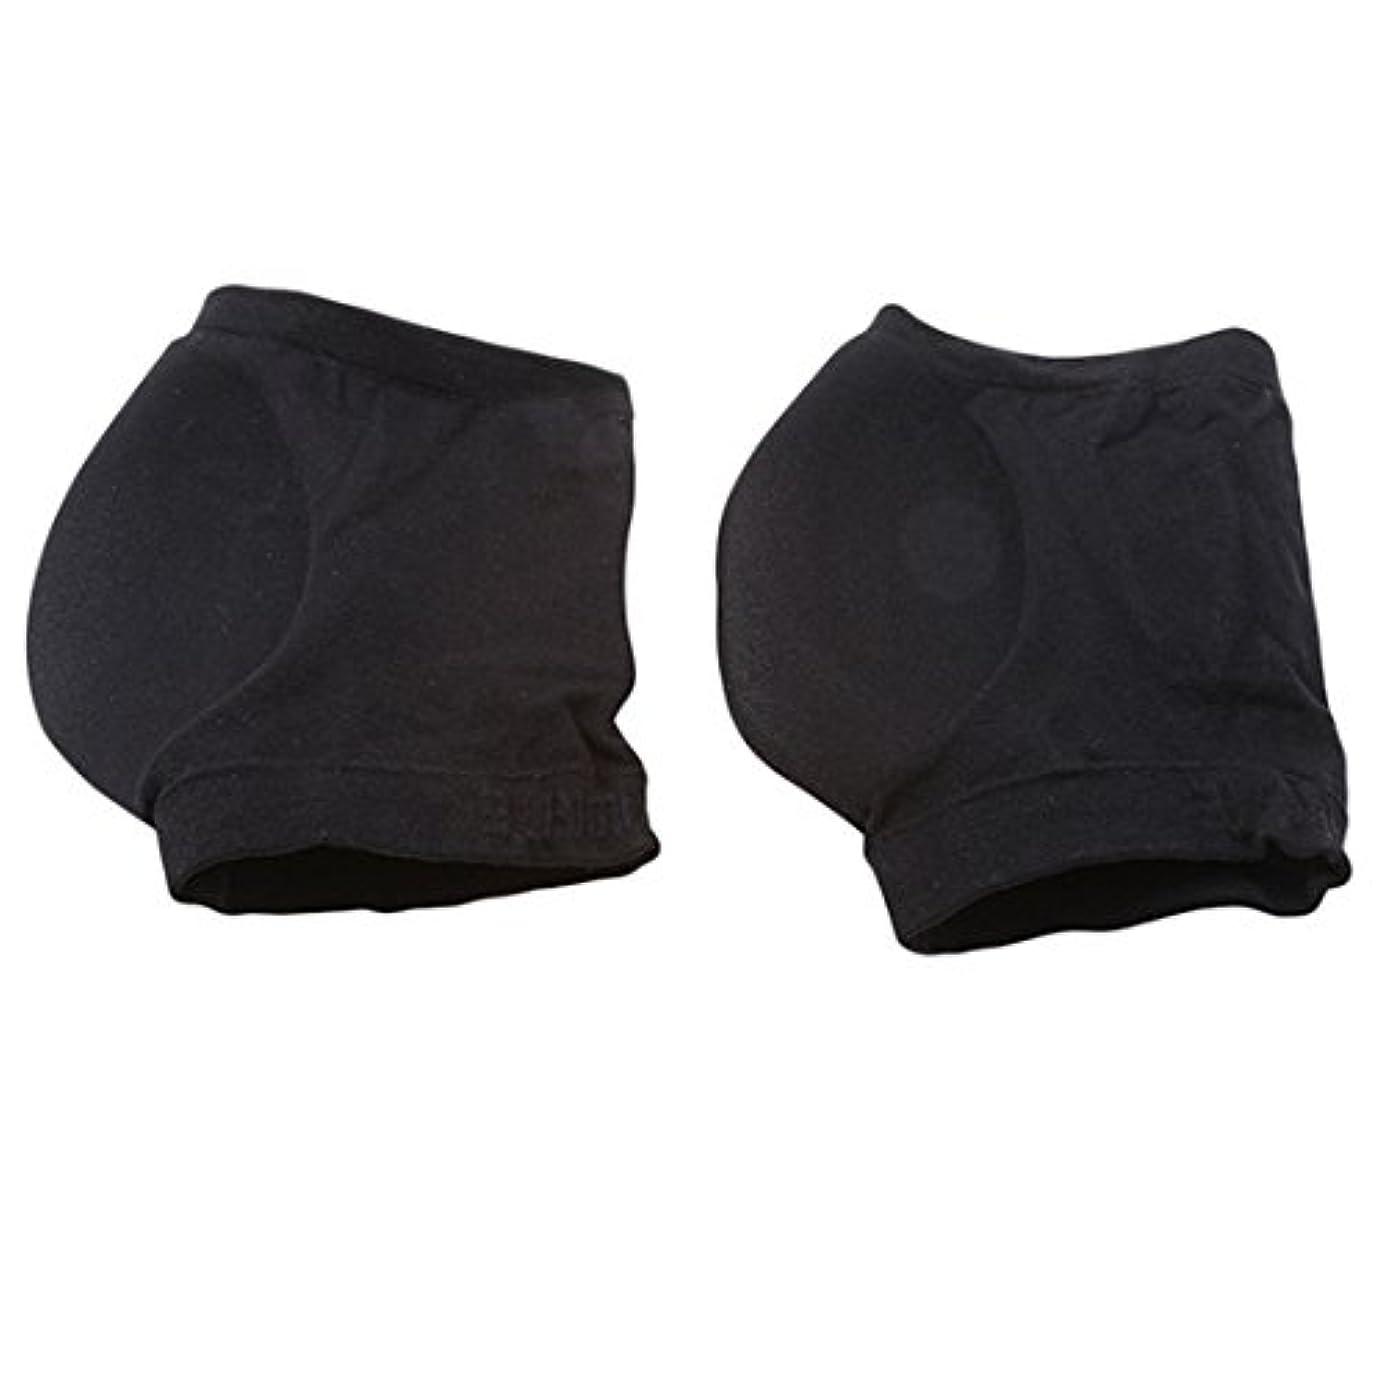 KLUMA 靴下 かかと ソックス 角質ケア うるおい 保湿 角質除去 足ケア レディース メンズ